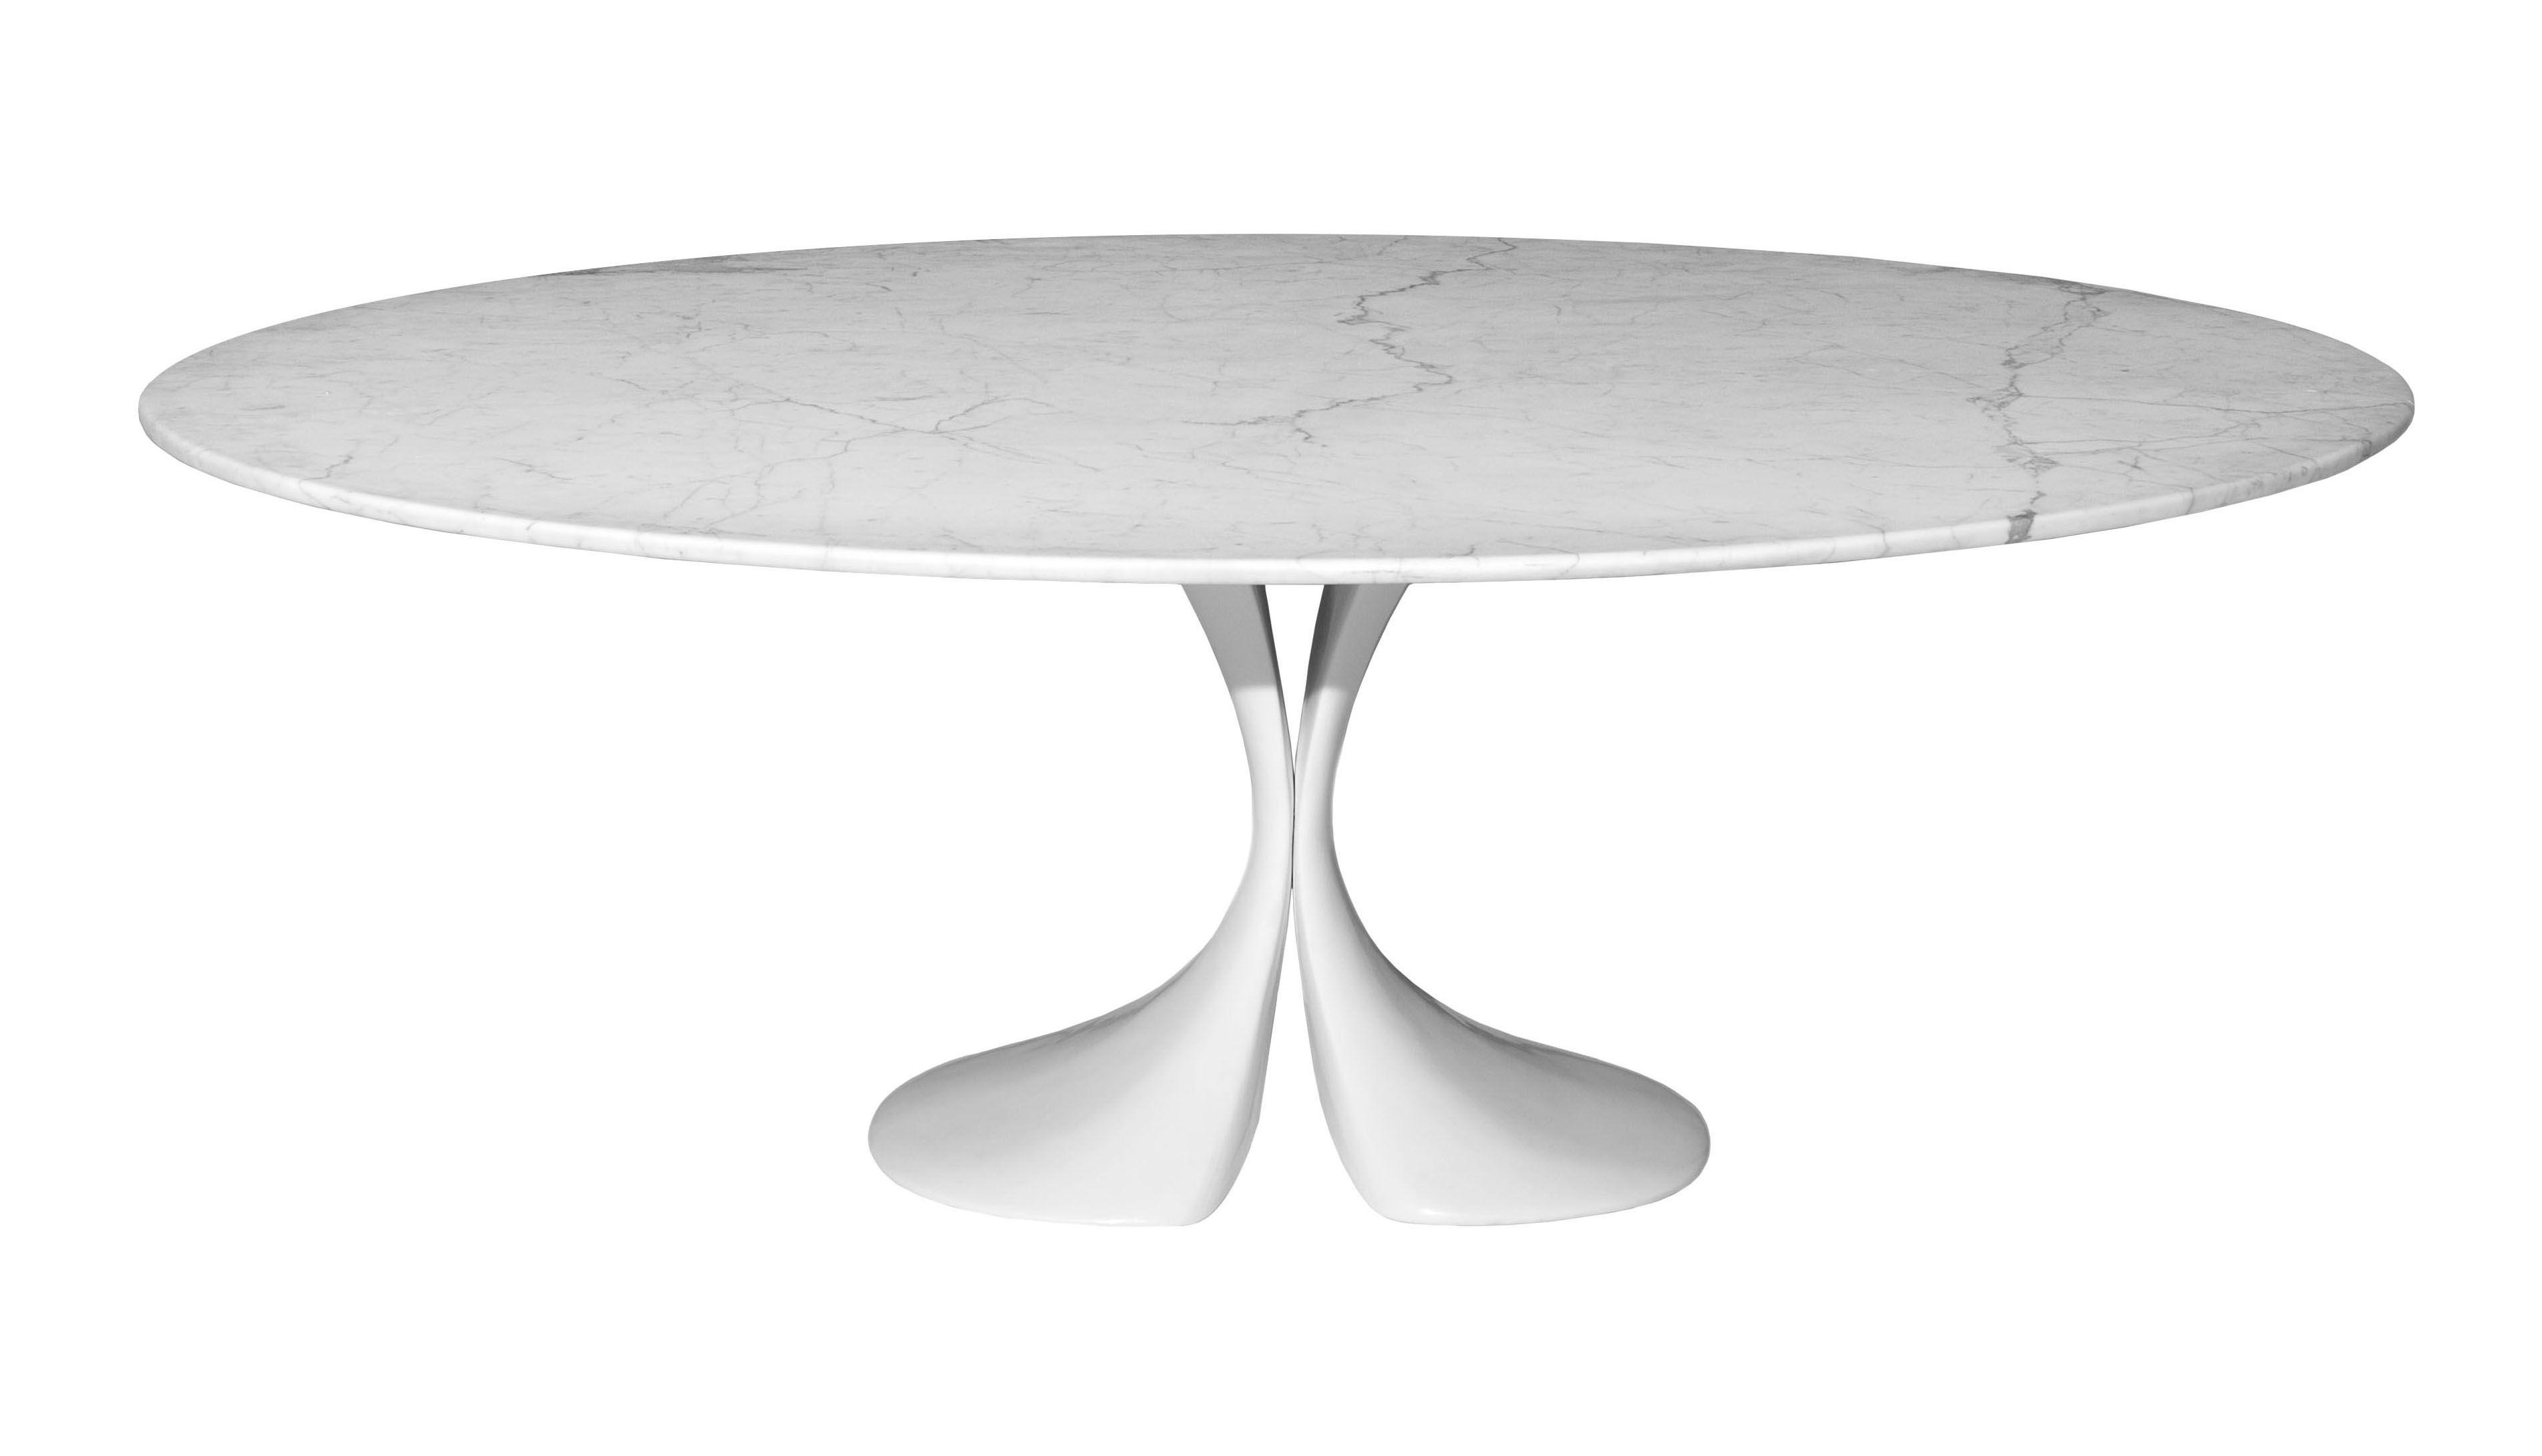 Tendances - Espace Repas - Table ovale Didymos / Marbre - 180 x 126 cm - Driade - Marbre / Blanc - Cristalplant, Marbre